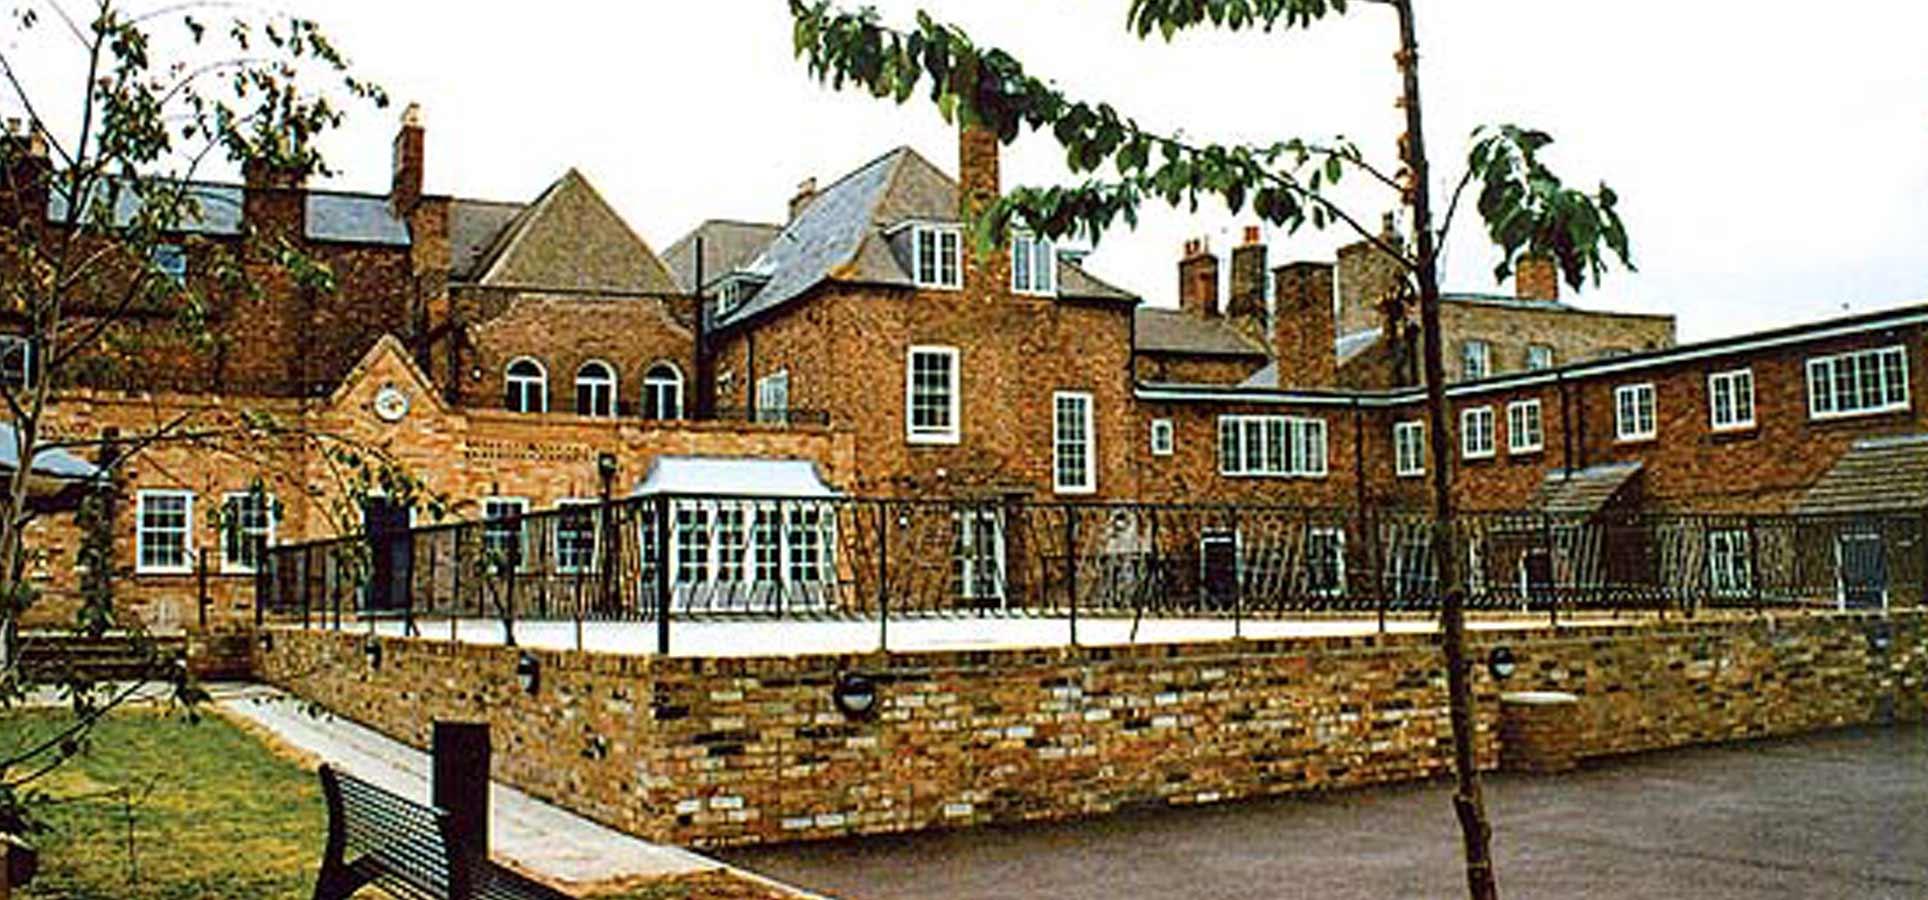 Residential School, Jessops Construction Ltd